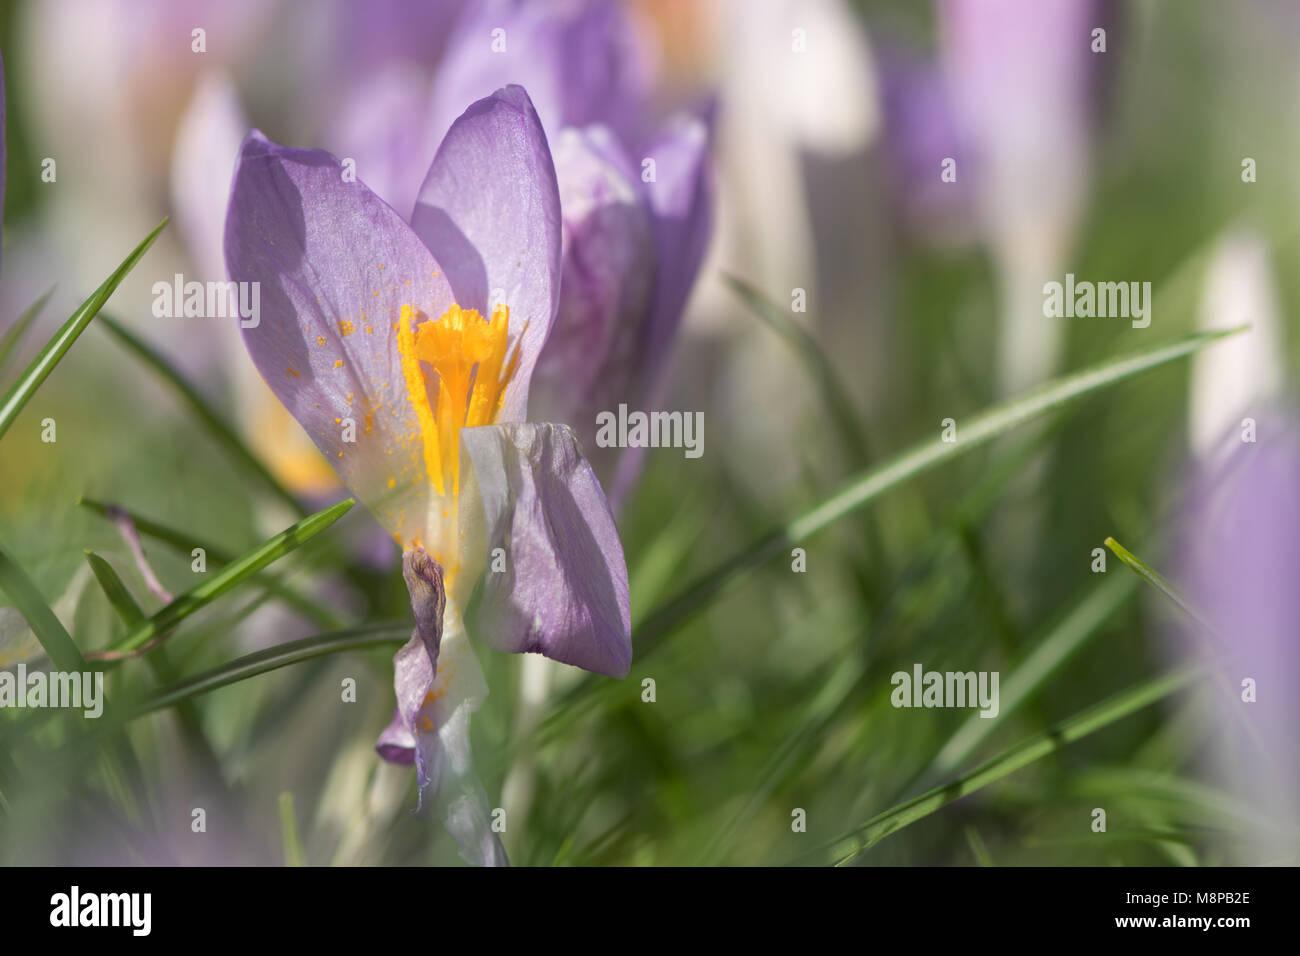 Purple Crocus sp. flowering amongst grass. Late winter flower (family Iridaceae) showing yellow stamens among grass - Stock Image